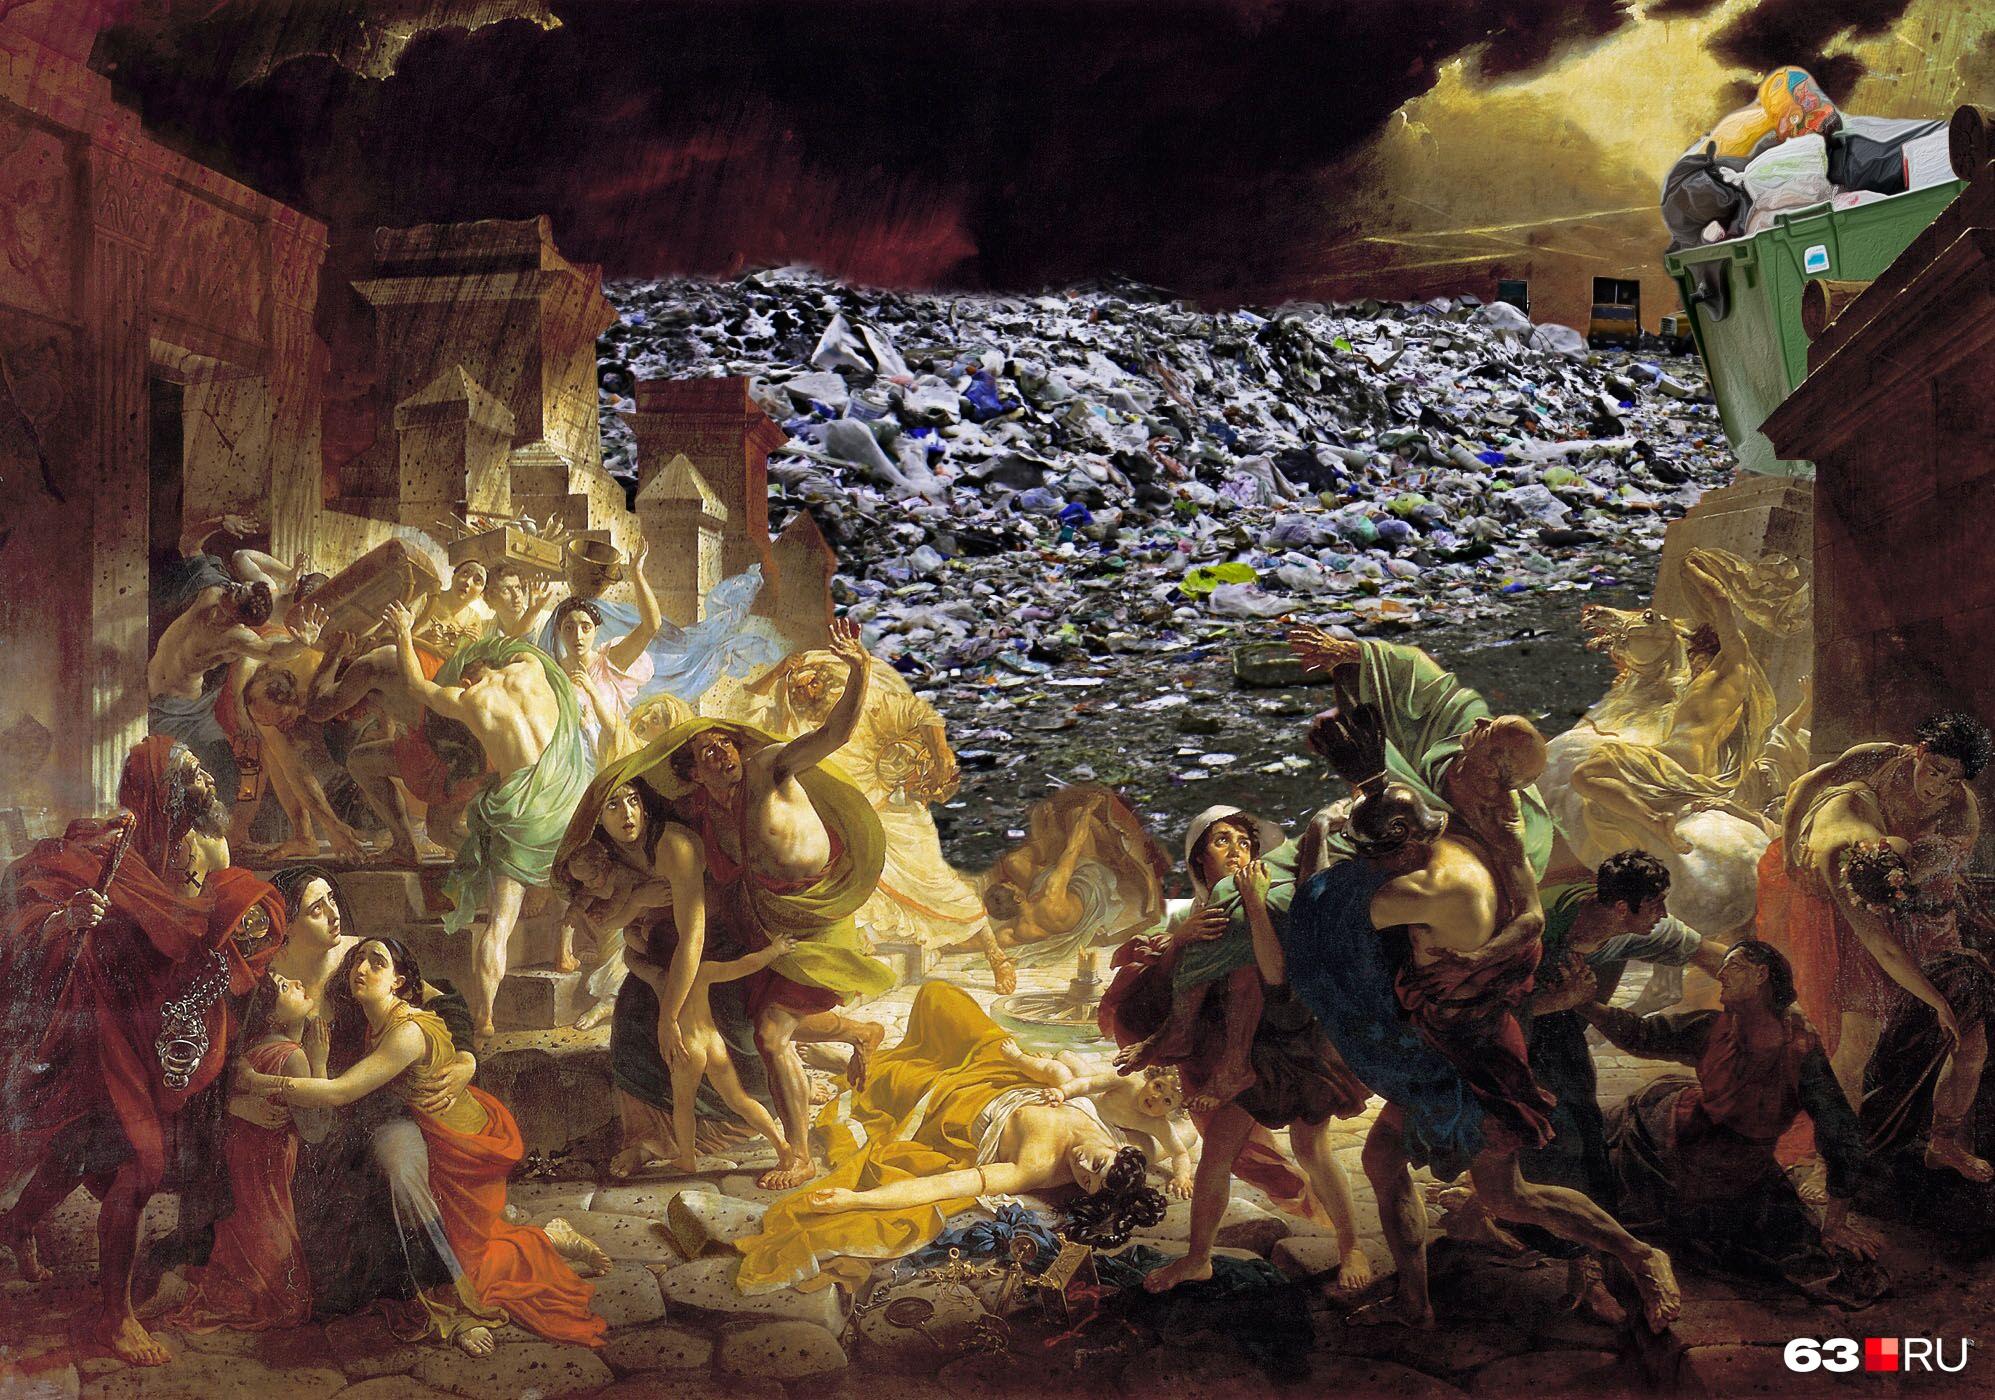 Мусорная революция, как лава с вулкана в Помпеях, накрыла самарцев